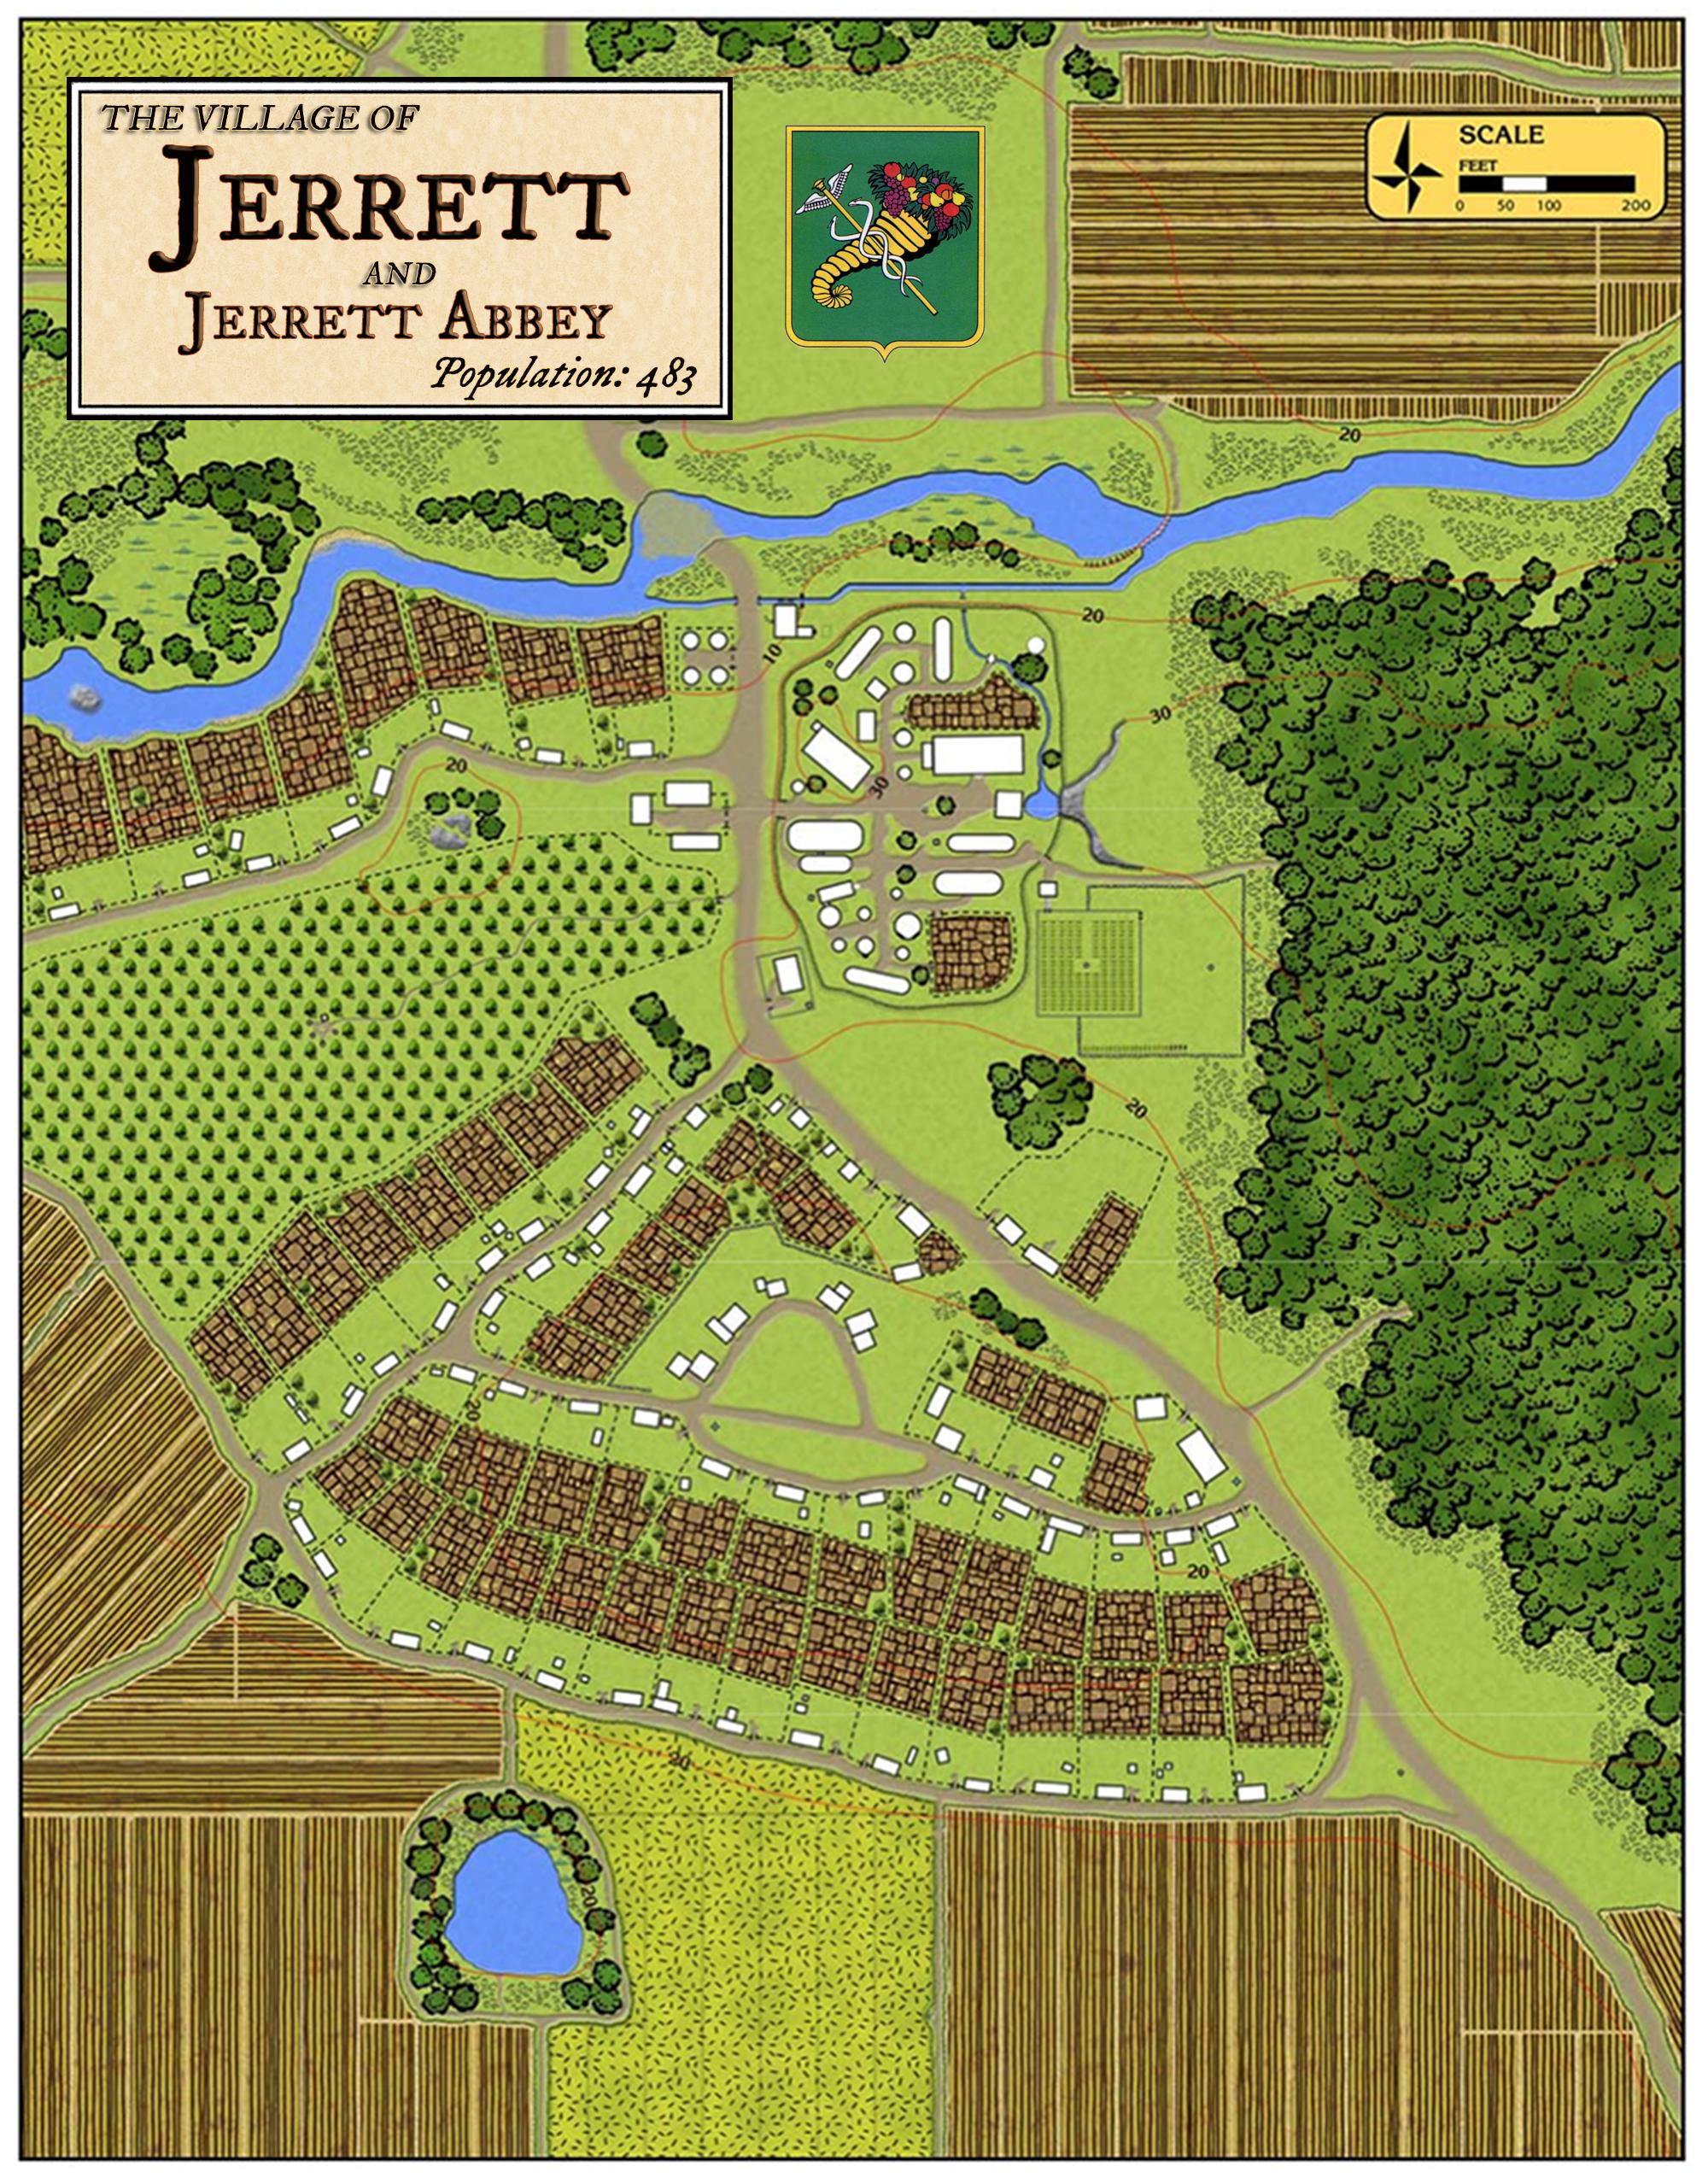 Jerrett1.jpg